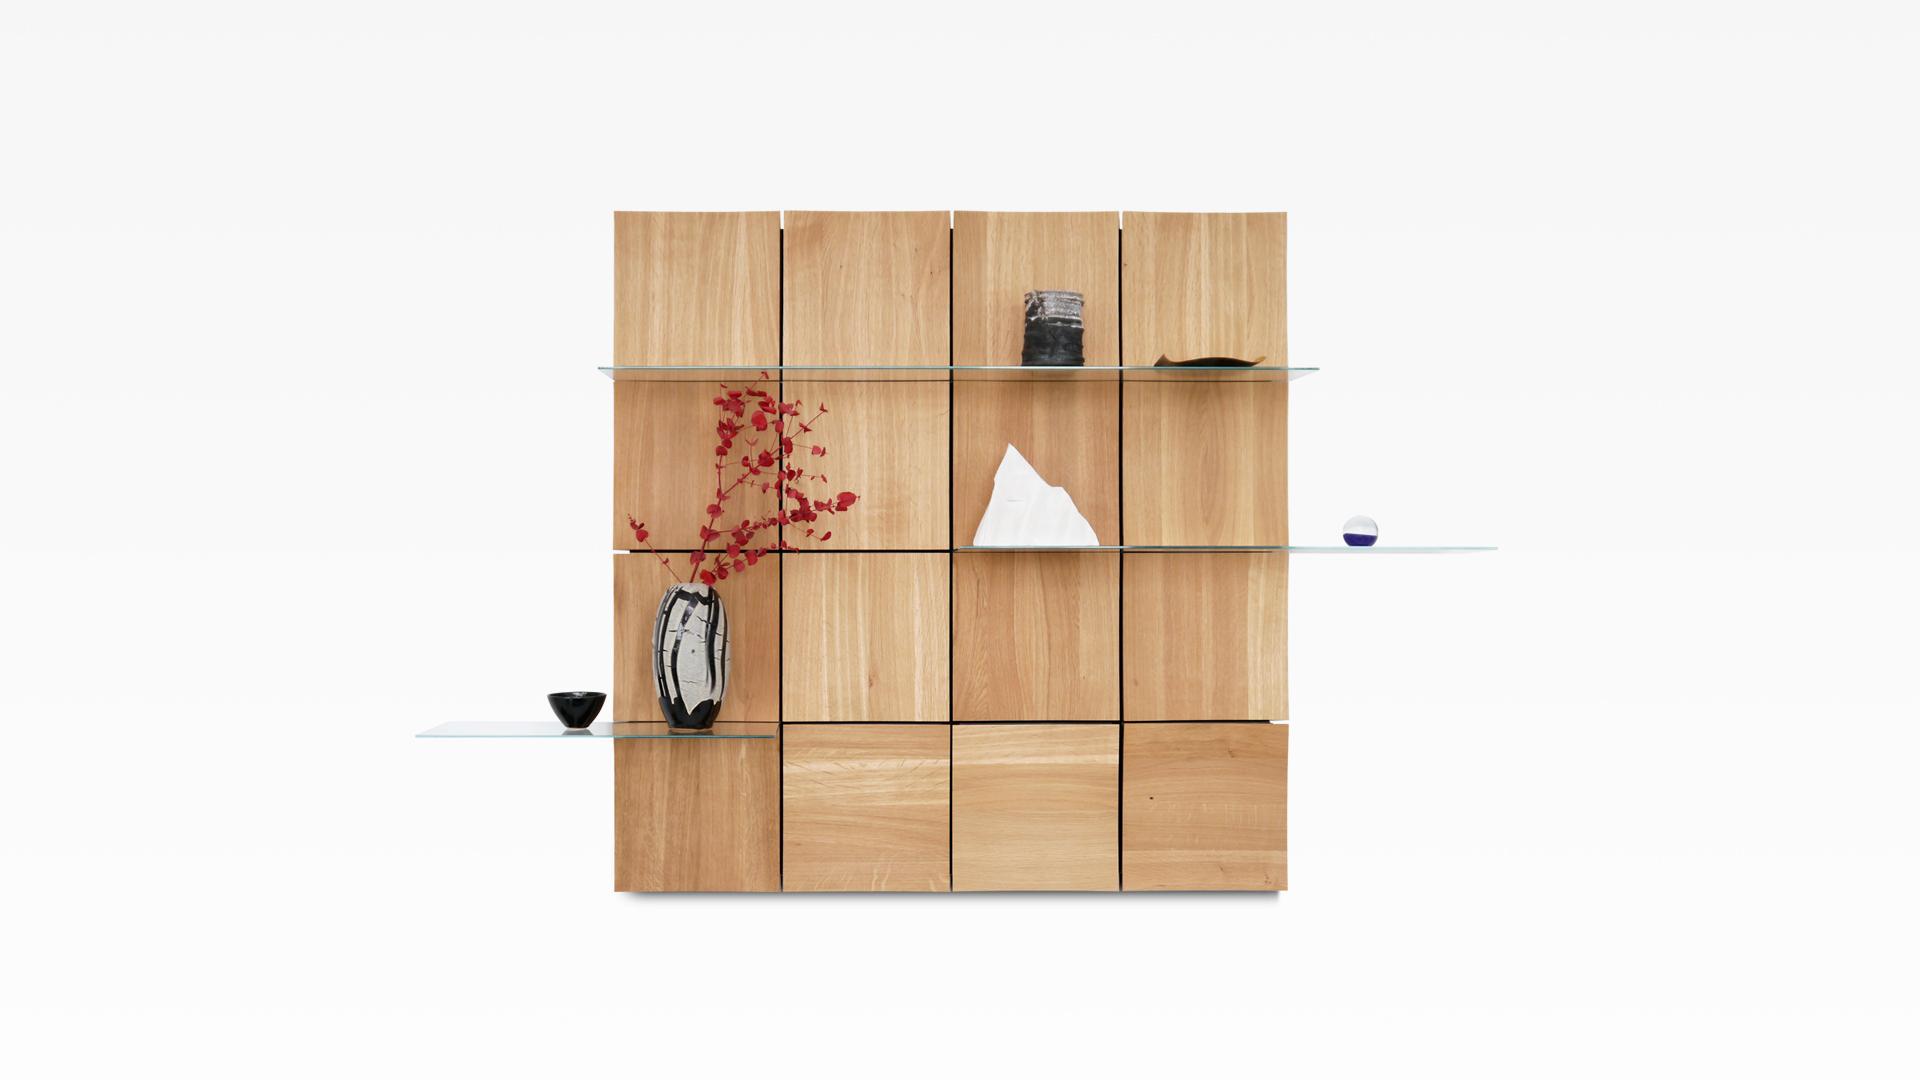 rs01 nami regal modulares regal modular shelf m nchner m belmanufaktur deutsu studio. Black Bedroom Furniture Sets. Home Design Ideas